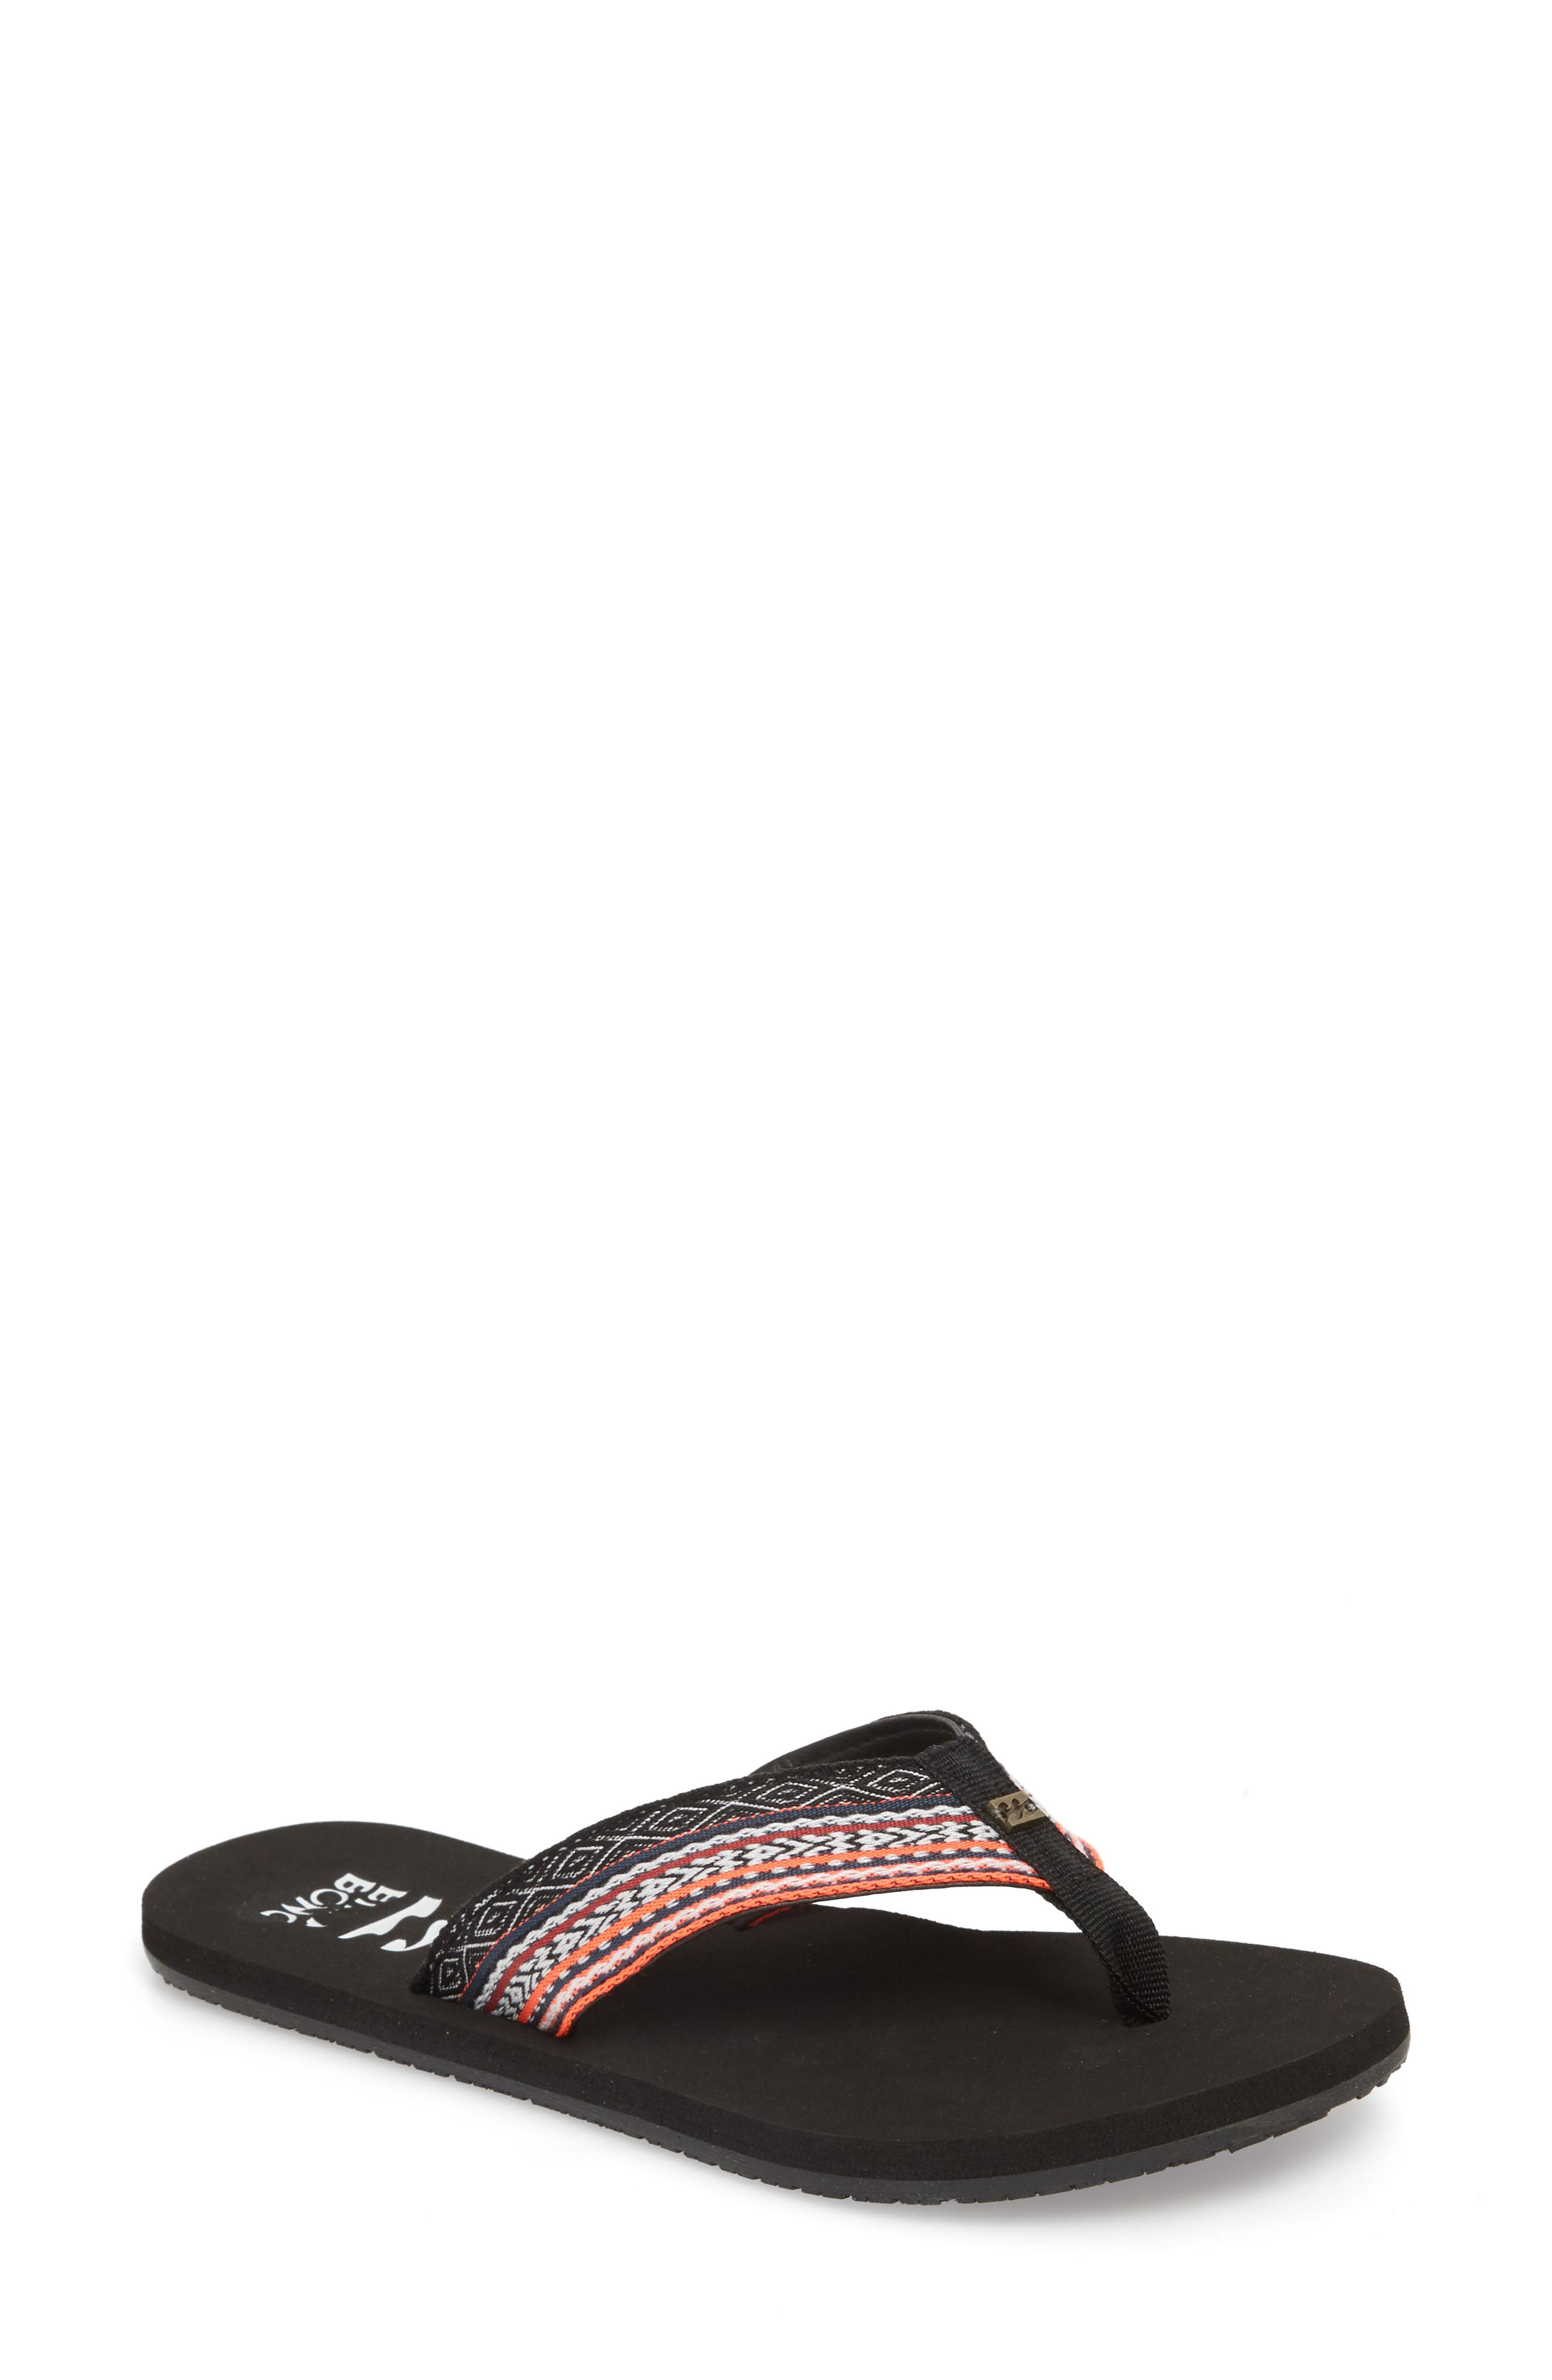 Baja Flip Flop,                         Main,                         color, BLACK CORAL